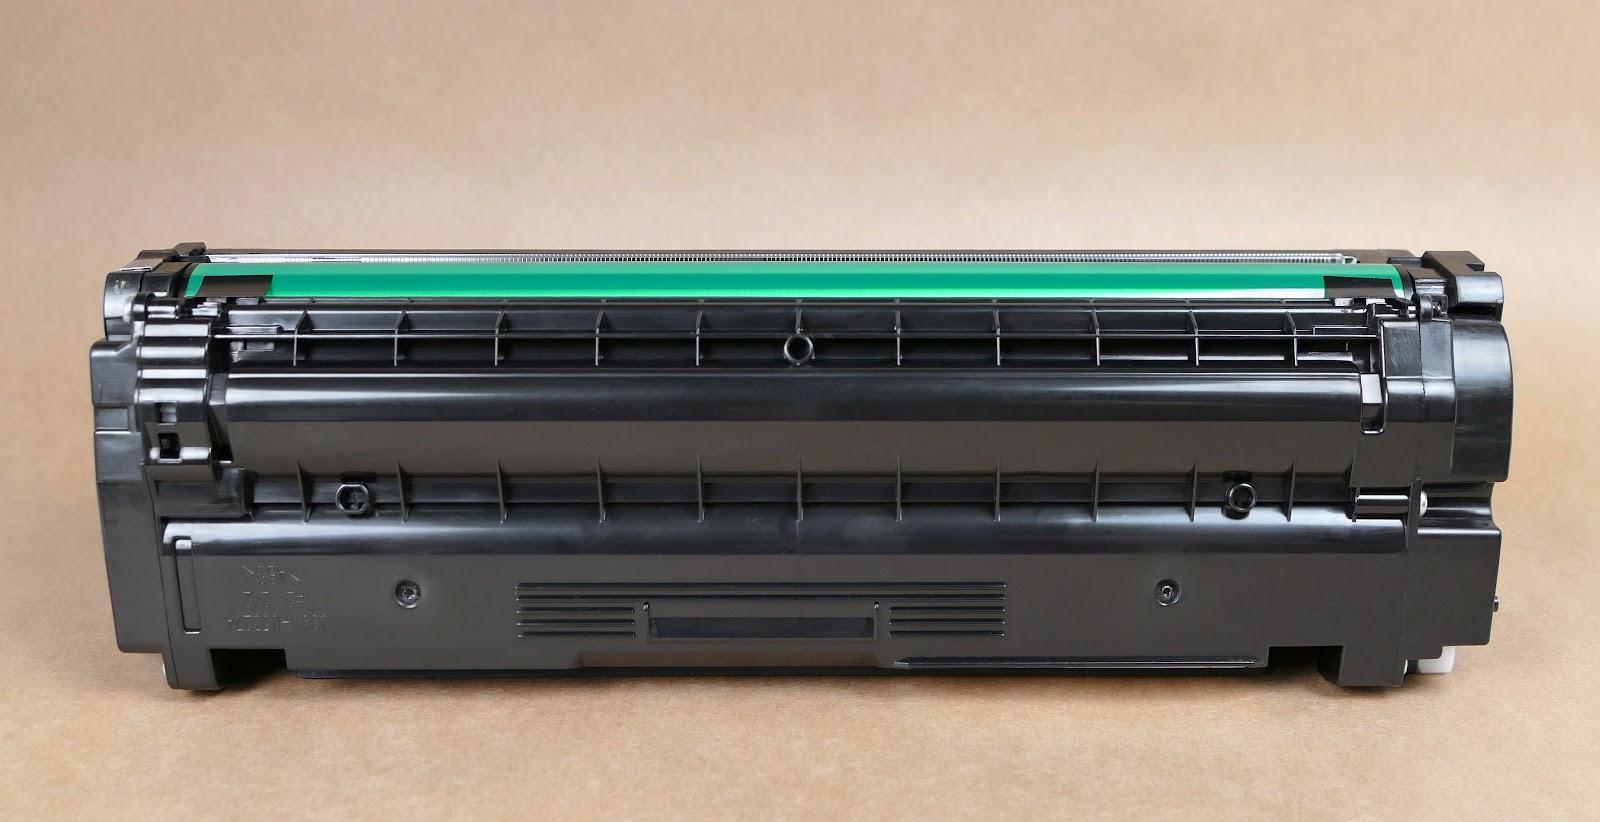 Samsung_laser_toner_cartridge.jpg